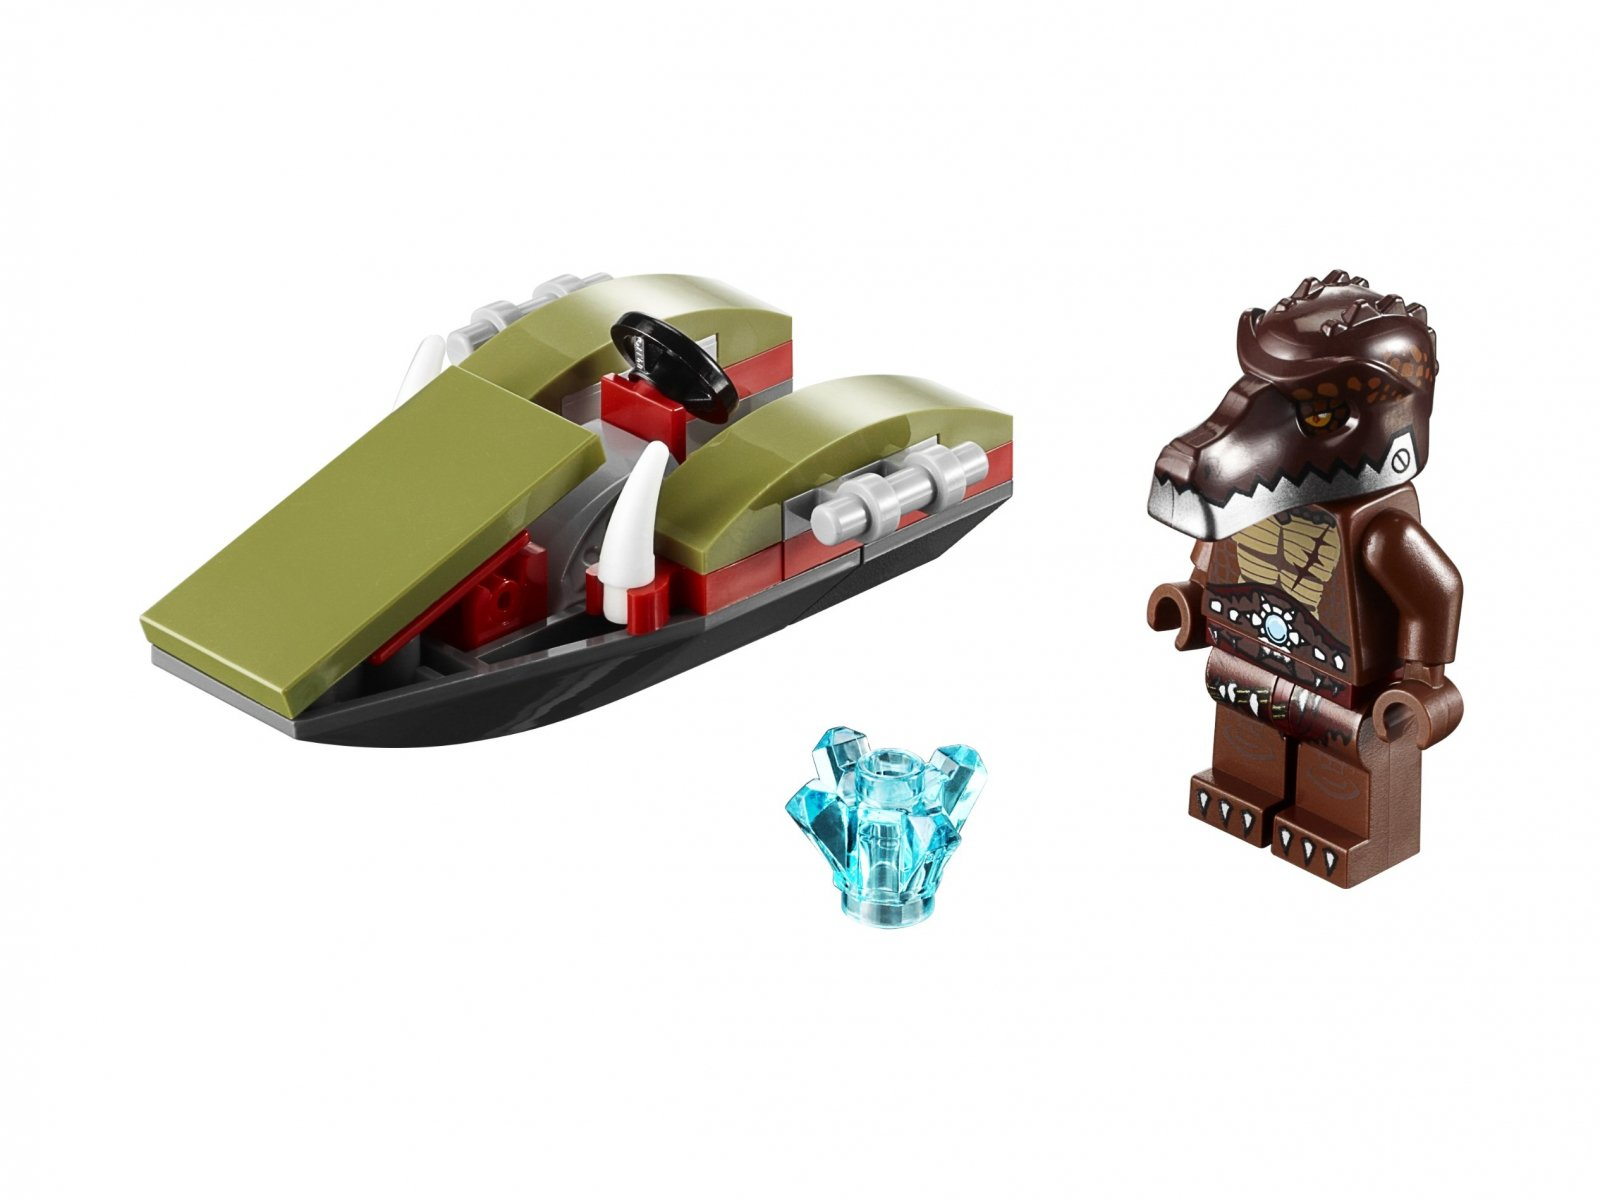 LEGO Legends of Chima™ Crug's Swamp Jet 30252